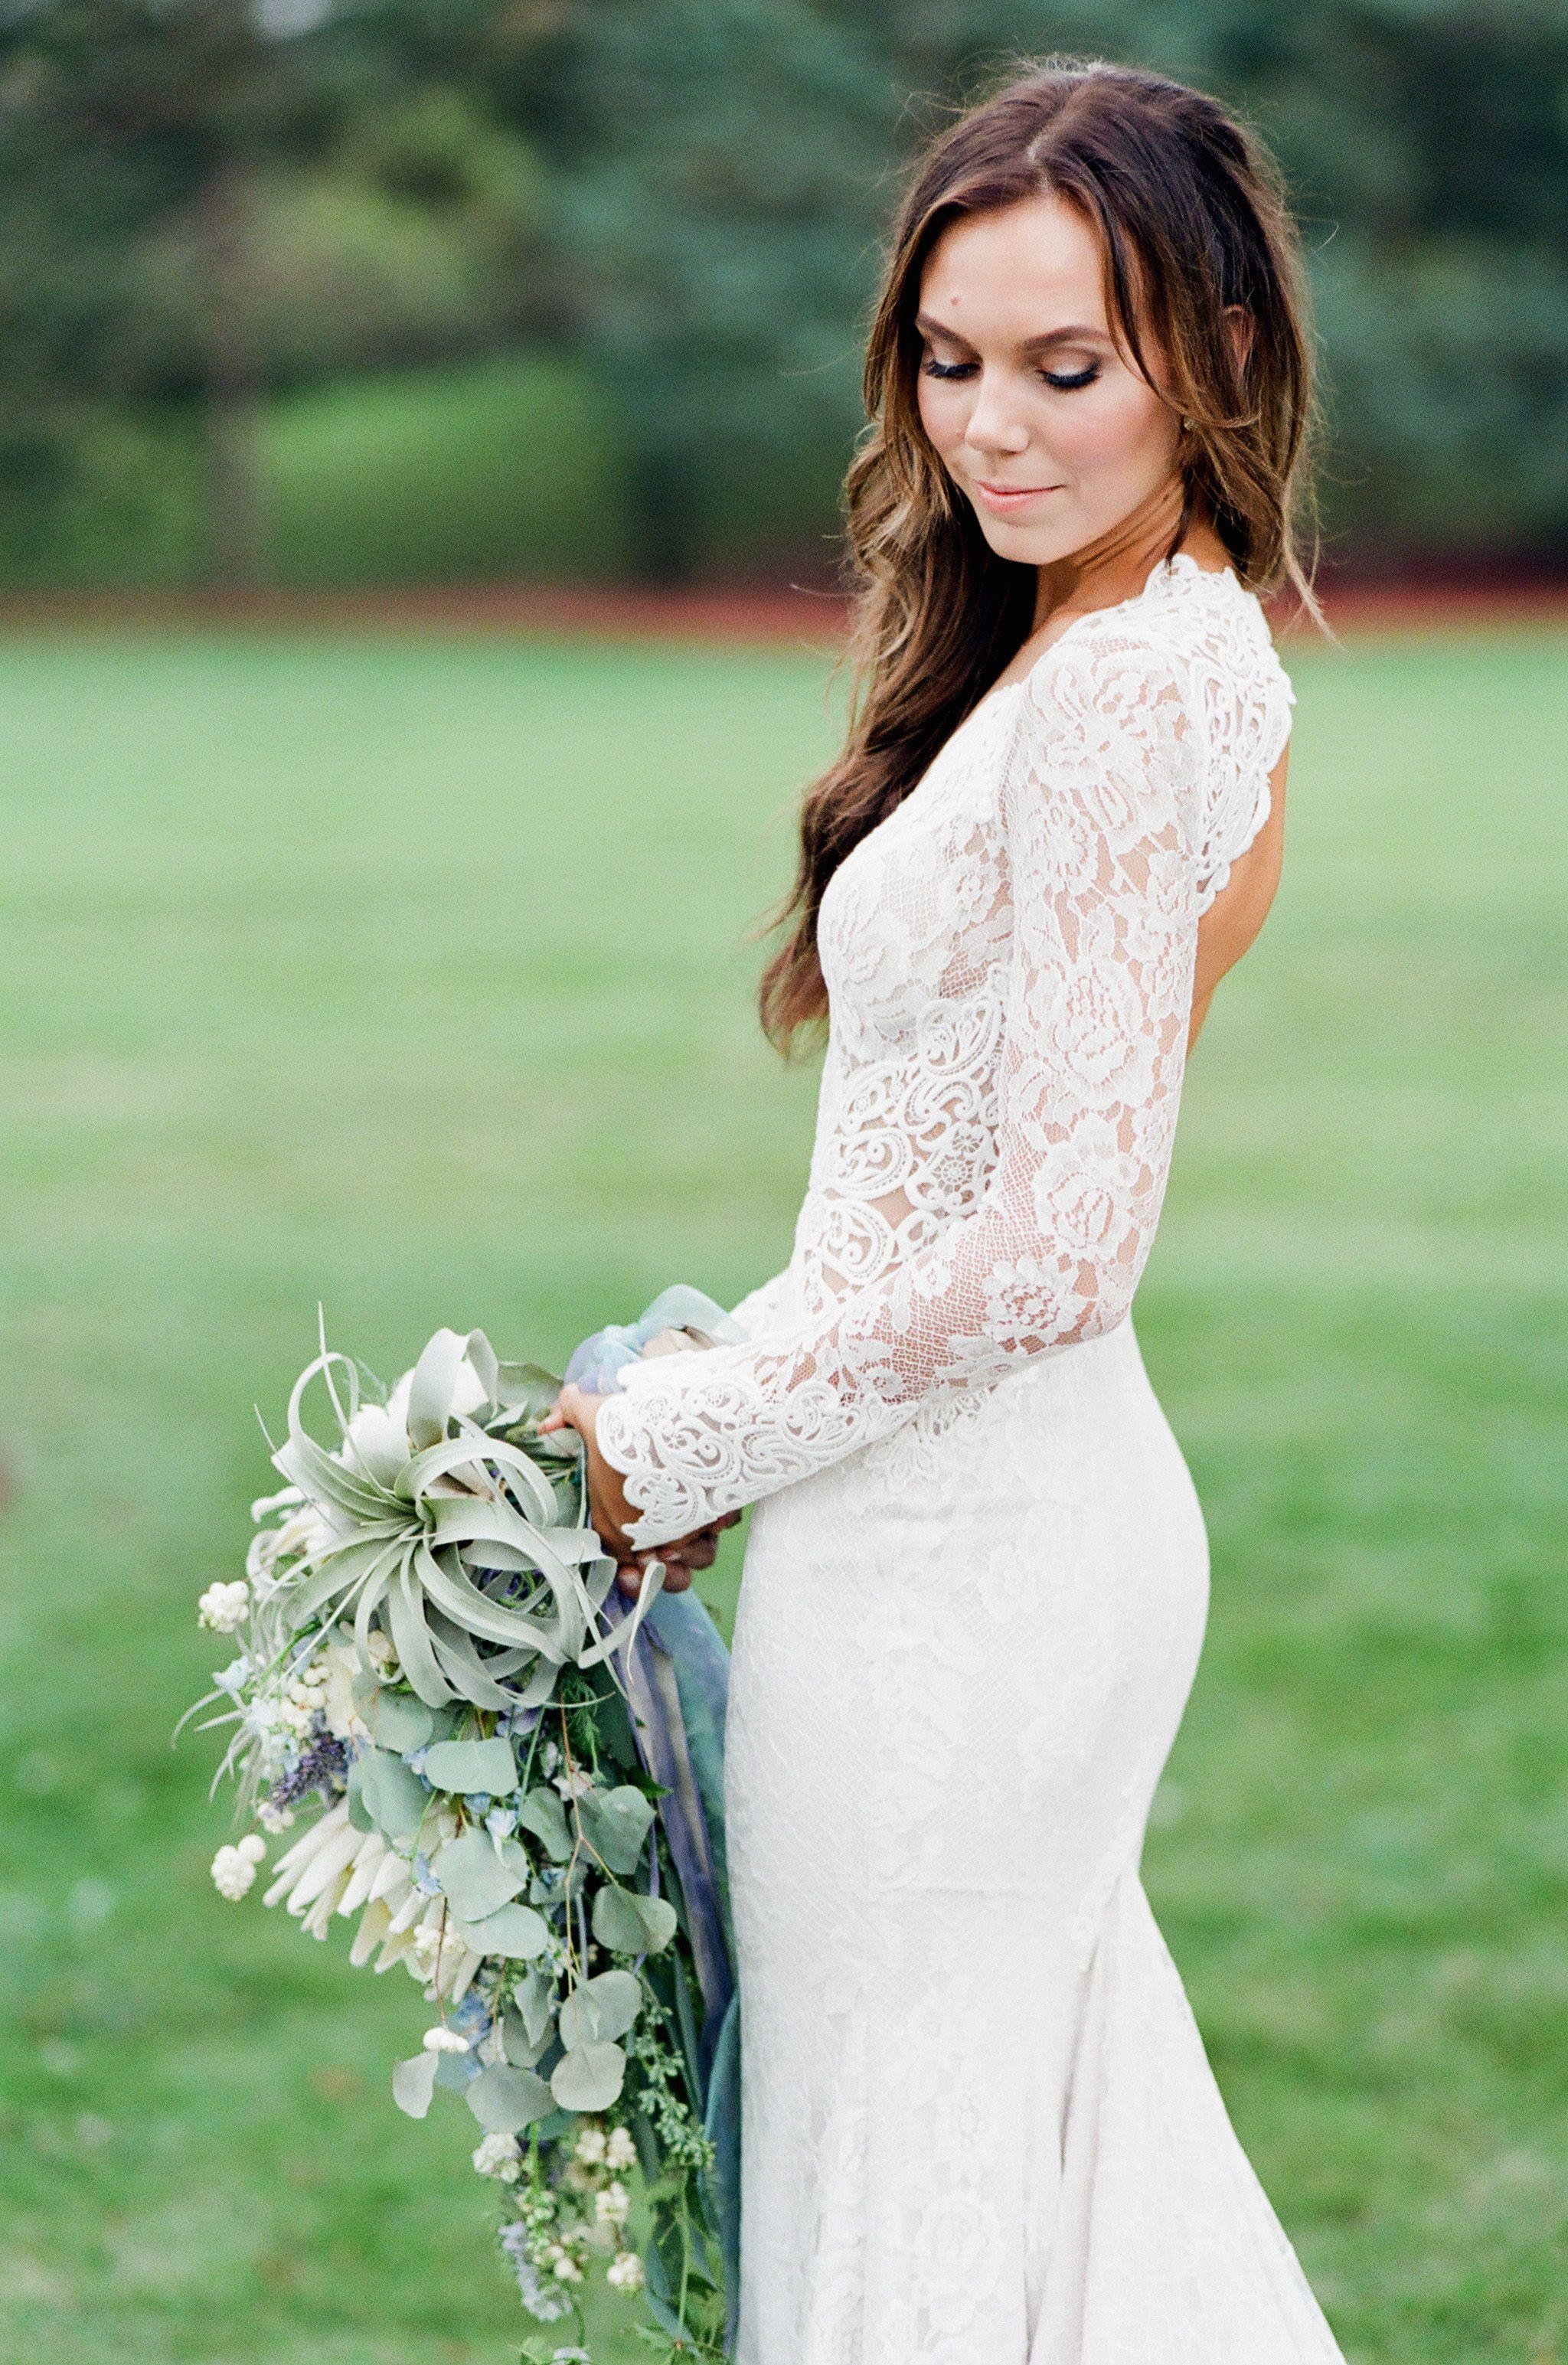 Stunning White Lace Long Sleeve Wedding Dress